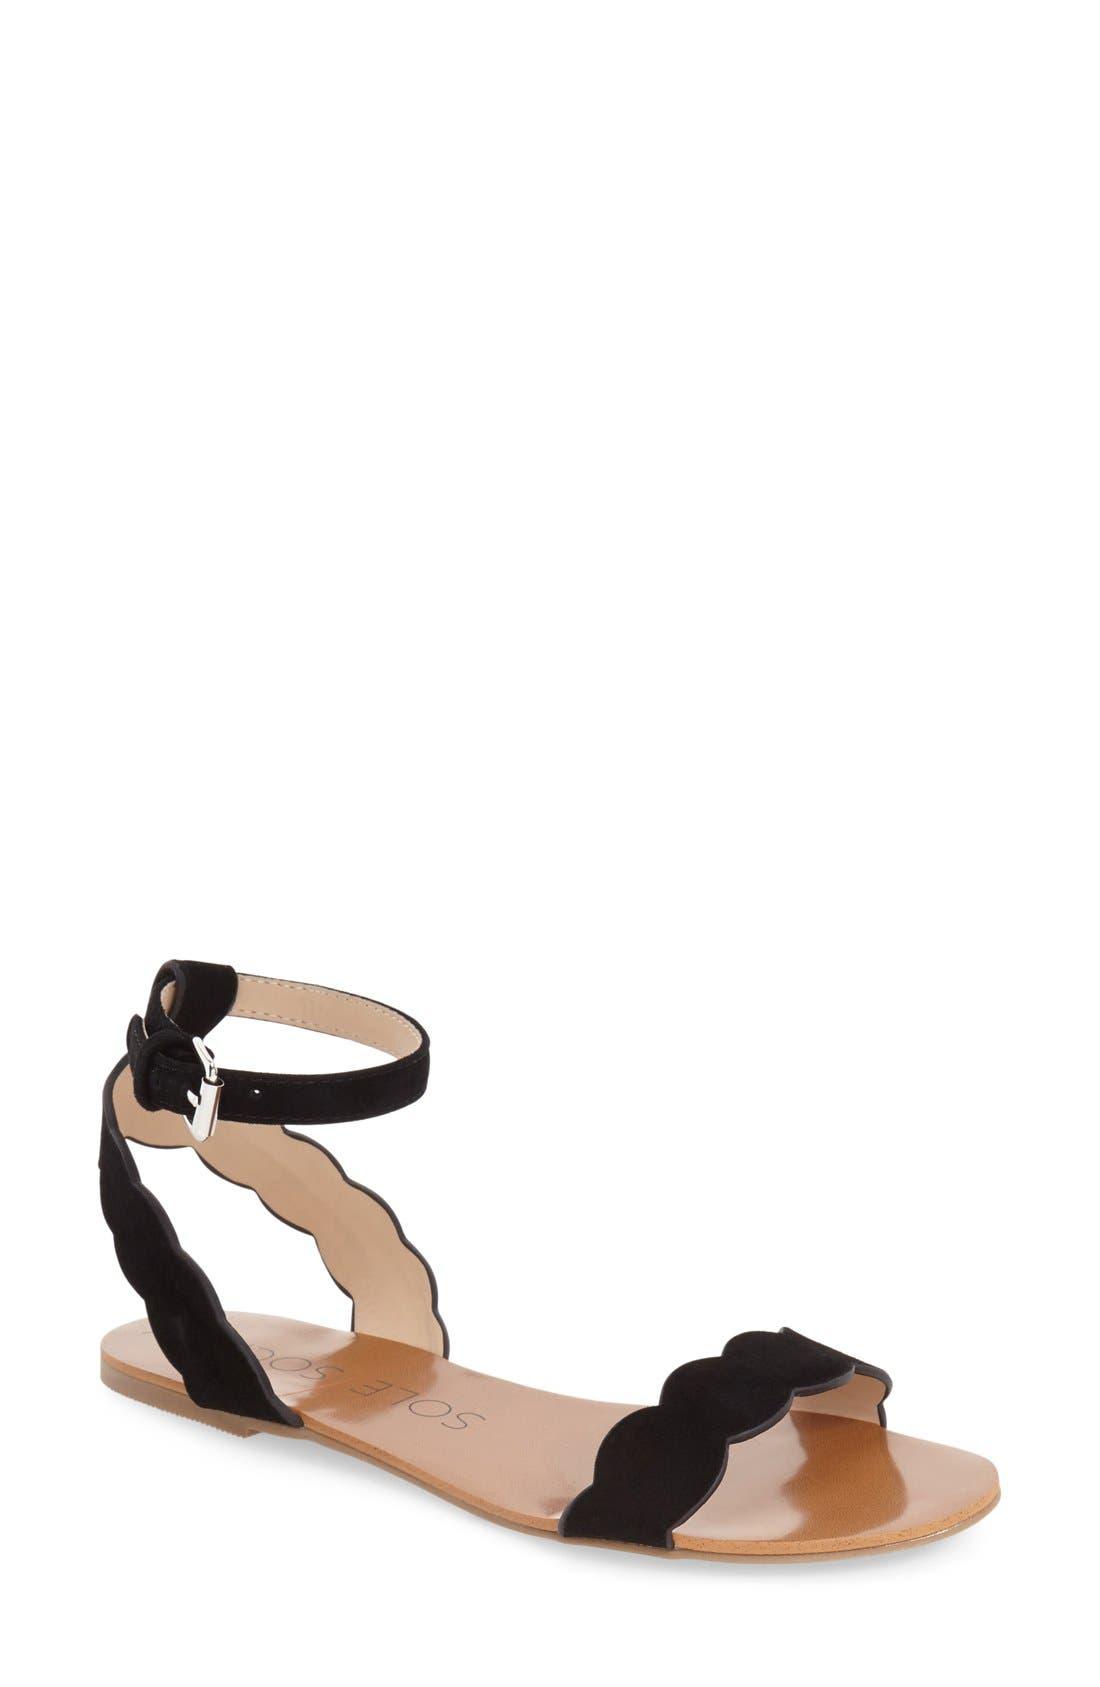 'Odette' Scalloped Ankle Strap Flat Sandal,                             Main thumbnail 3, color,